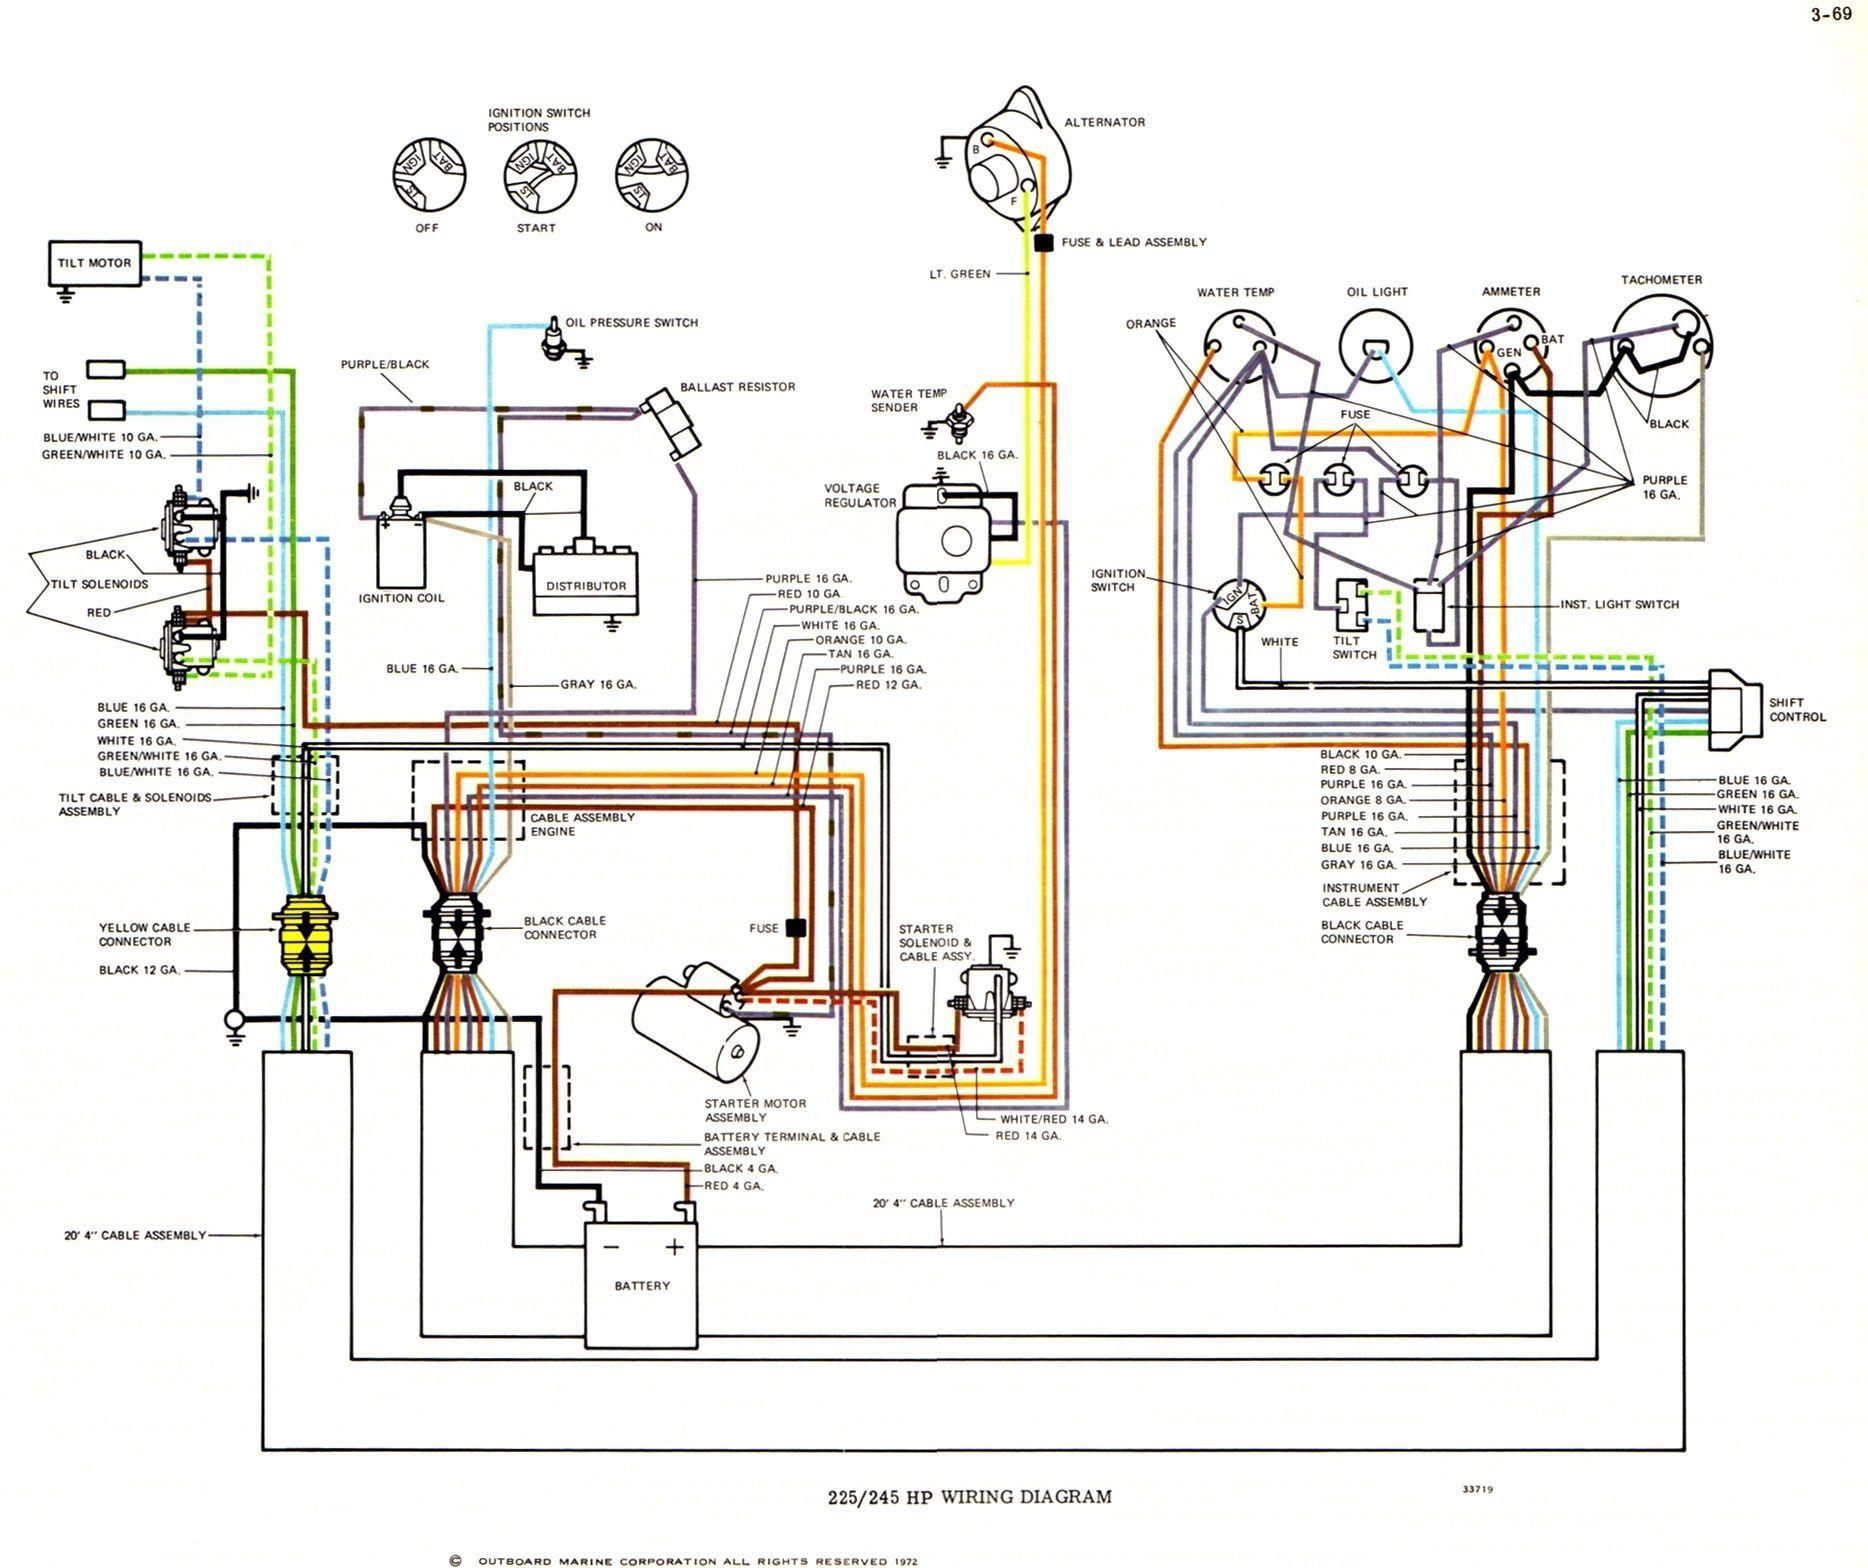 05 F150 Wiper Motor Wiring Diagram Electrical Wiring Diagram Boat Wiring Electrical Wiring